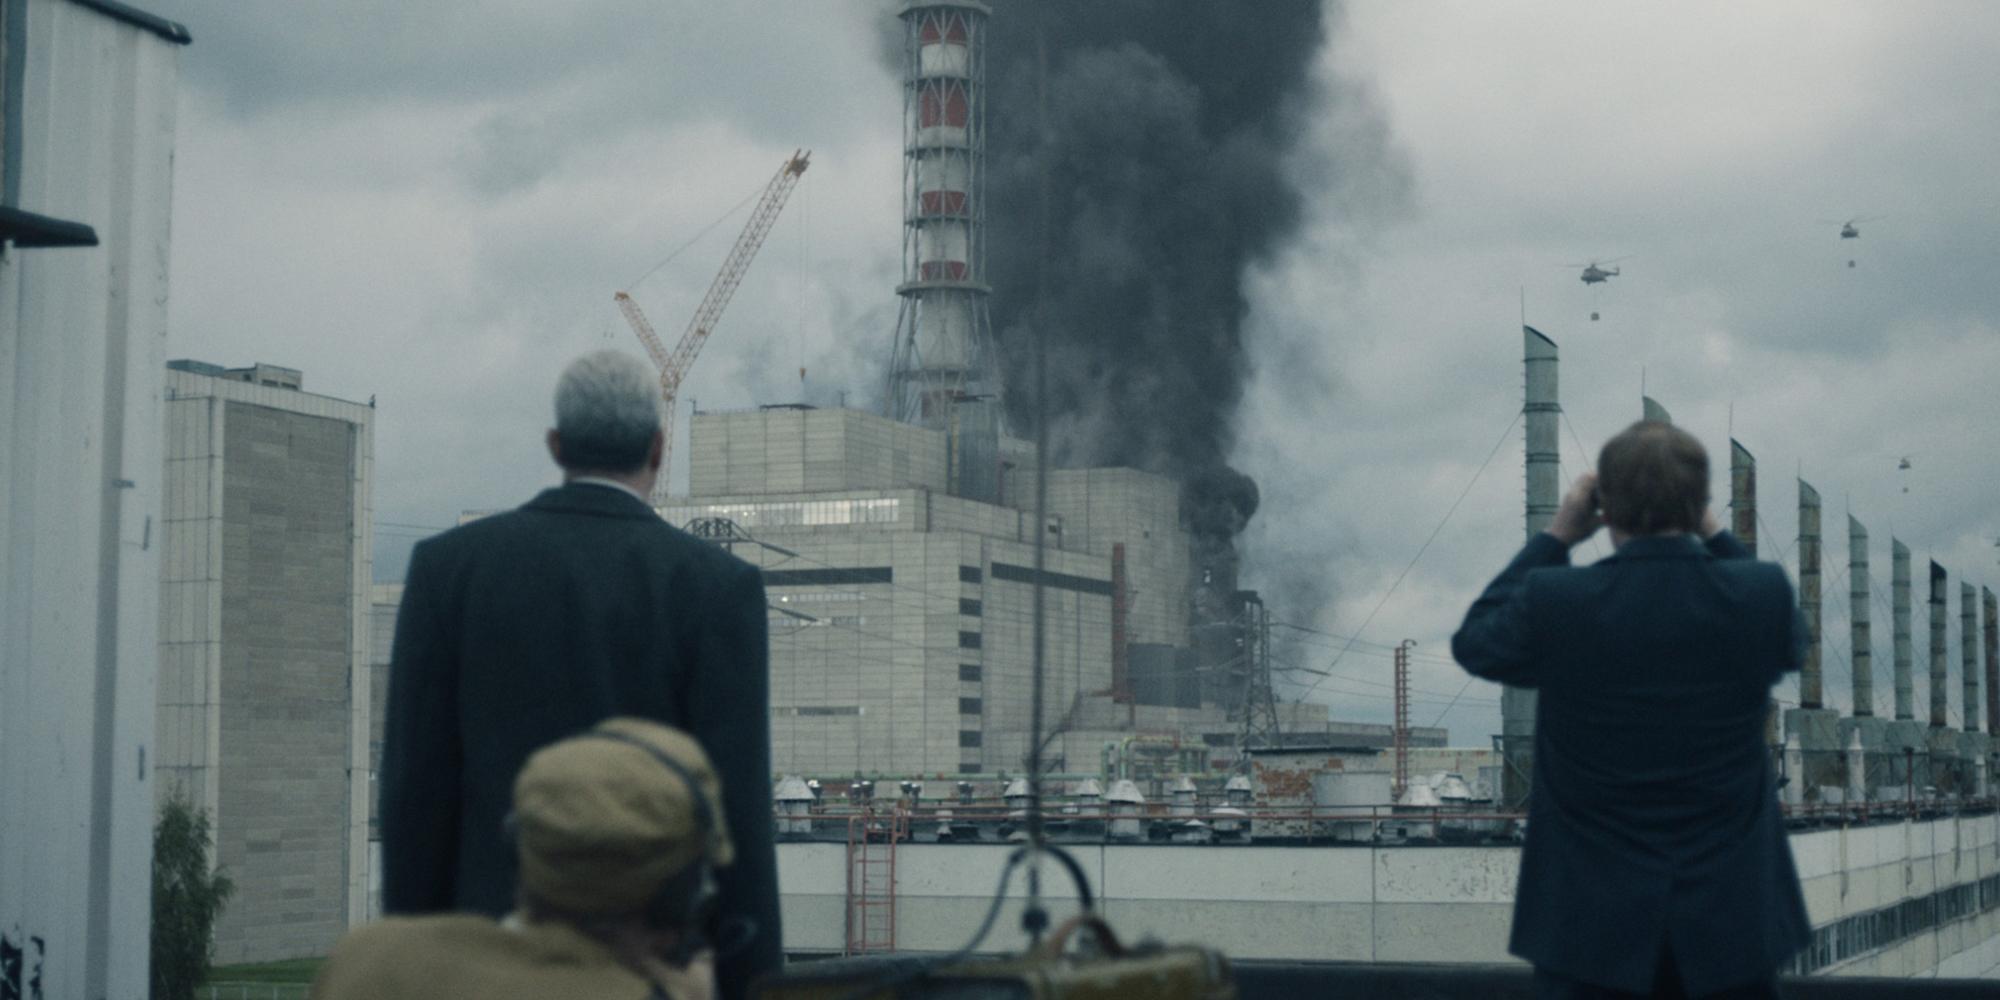 For 'Chernobyl' score, Hildur Guðnadóttir went to a nuclear power plant